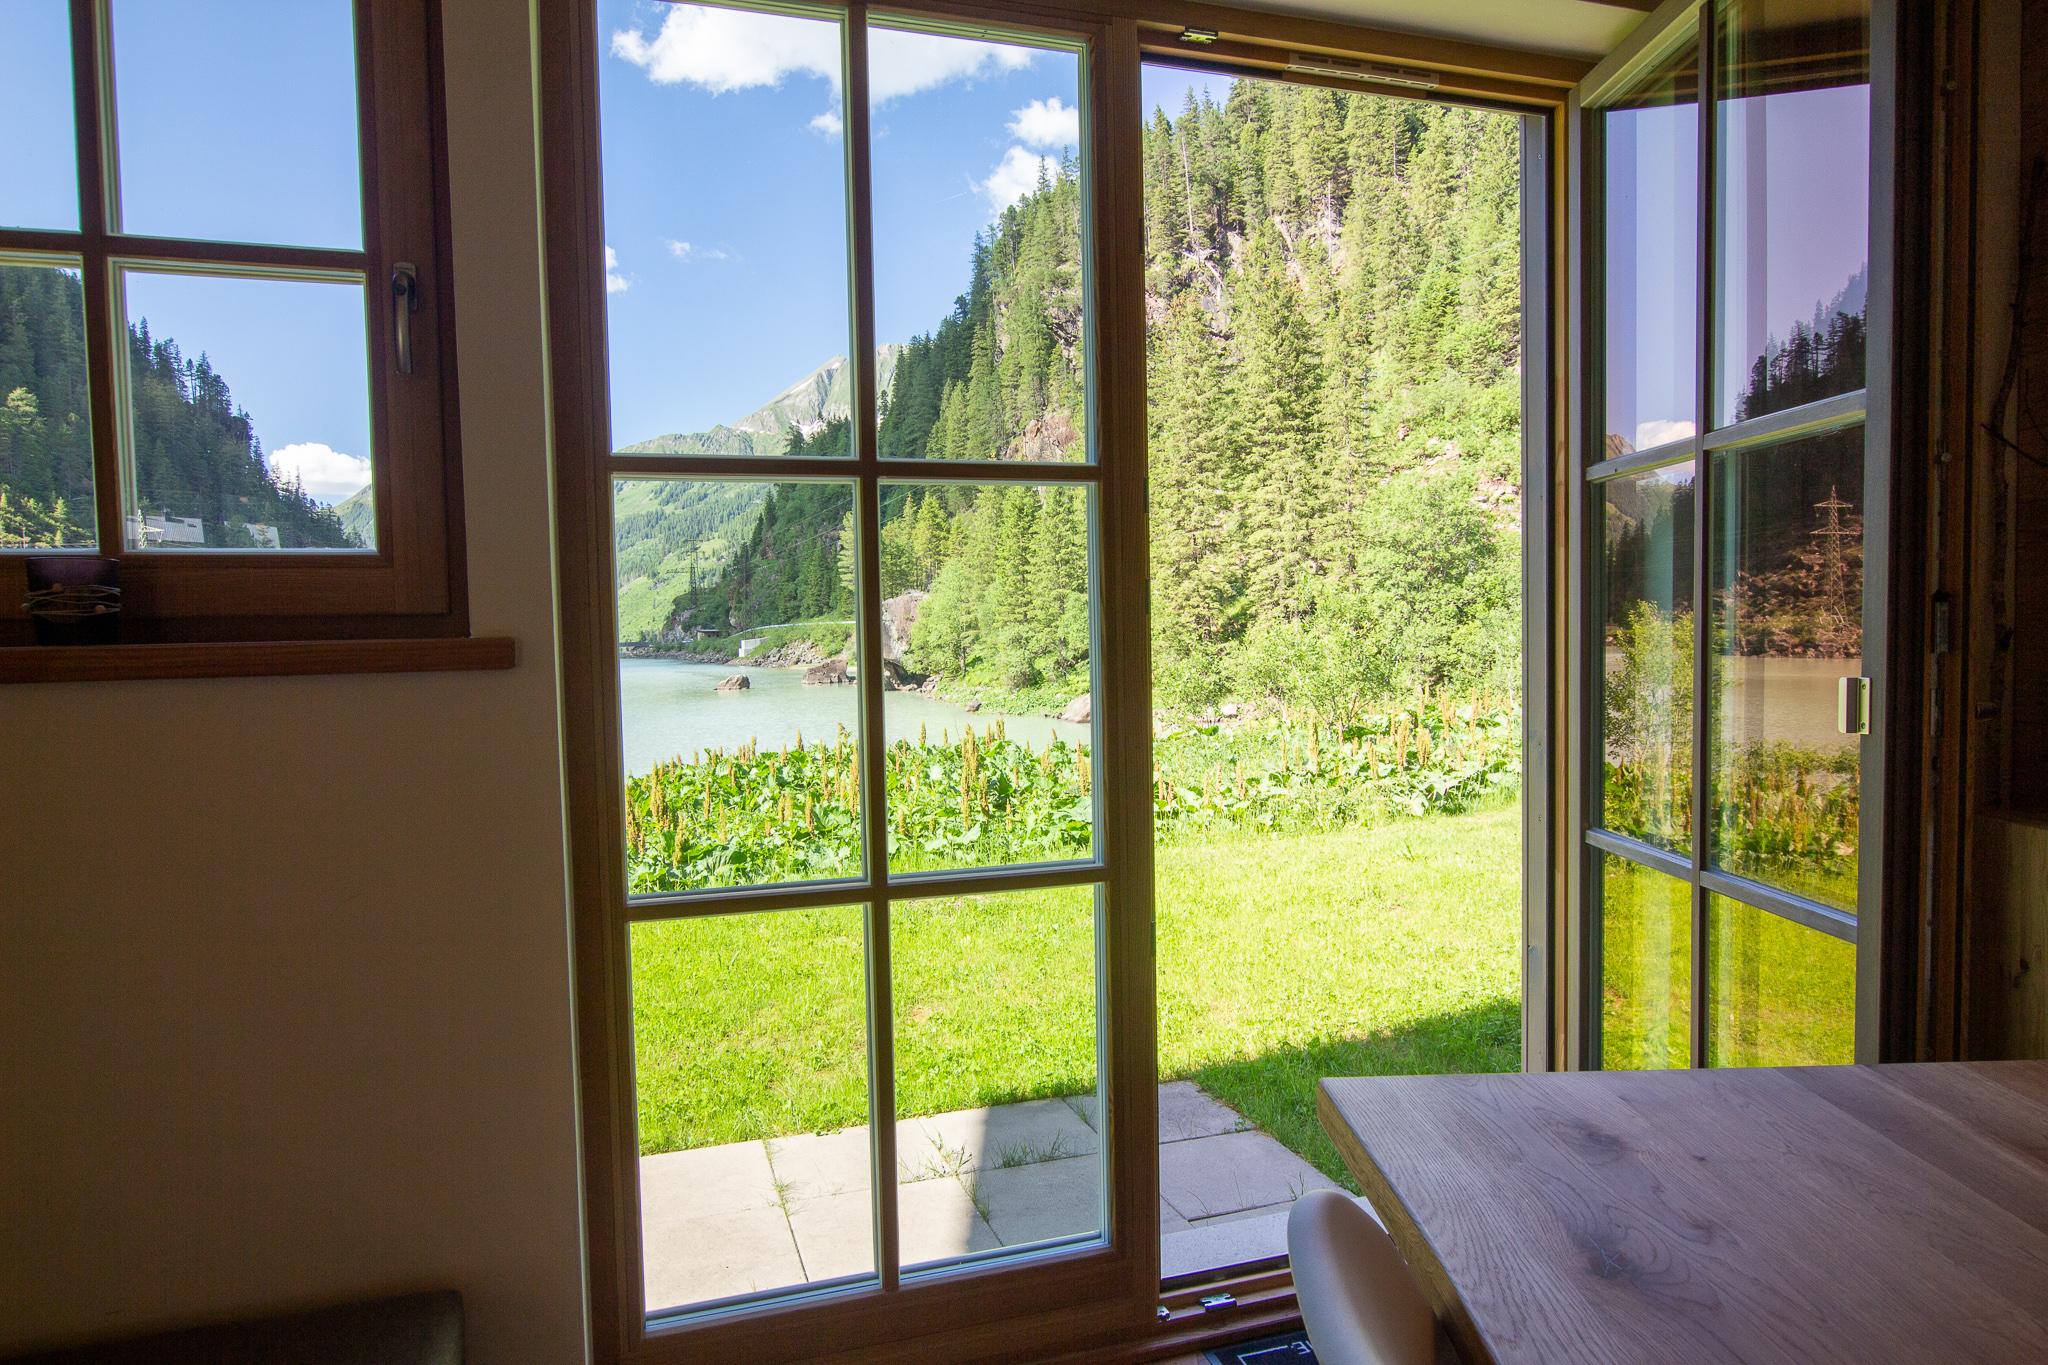 Maison de vacances Lodge Seeblick am Skilift und Bergsee für 5 (2636751), Uttendorf, Pinzgau, Salzbourg, Autriche, image 31